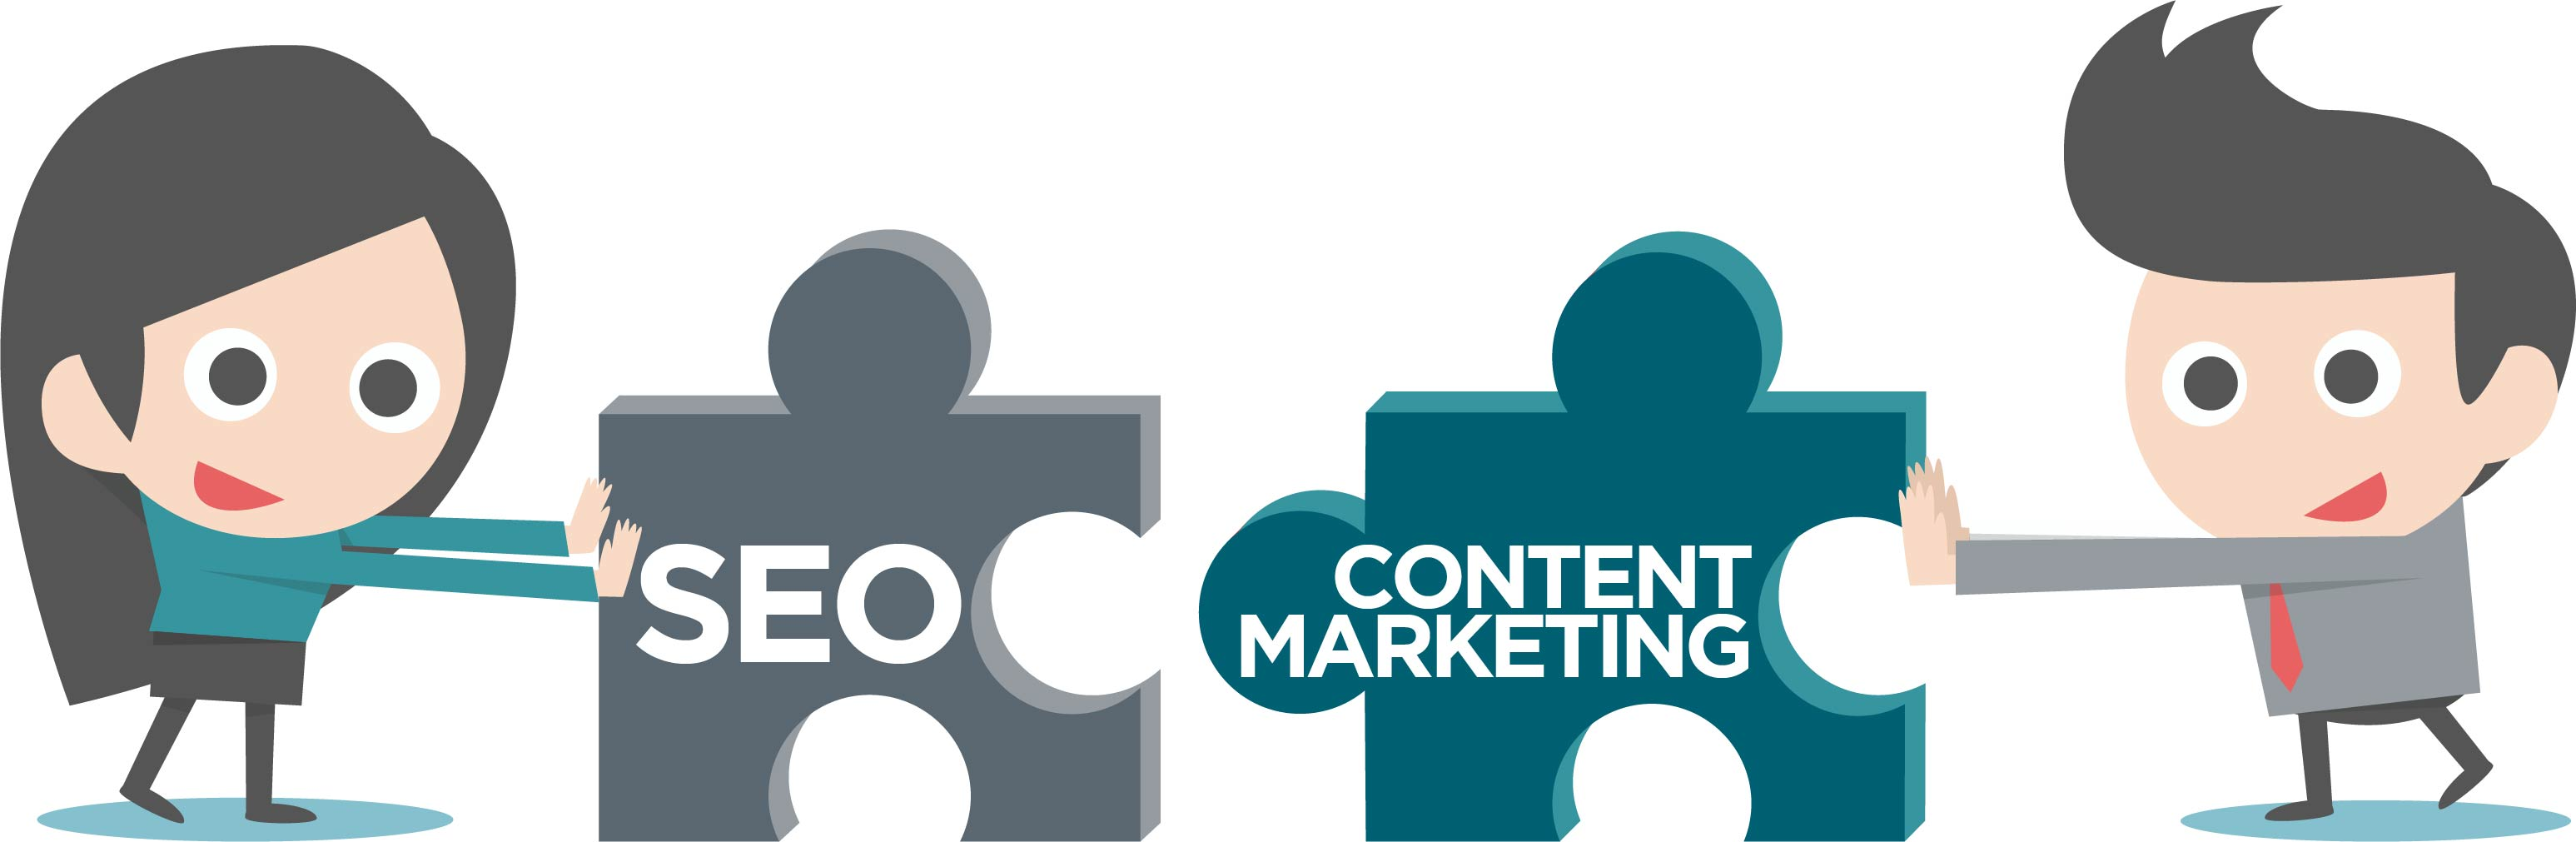 SEO Content Marketing.jpg